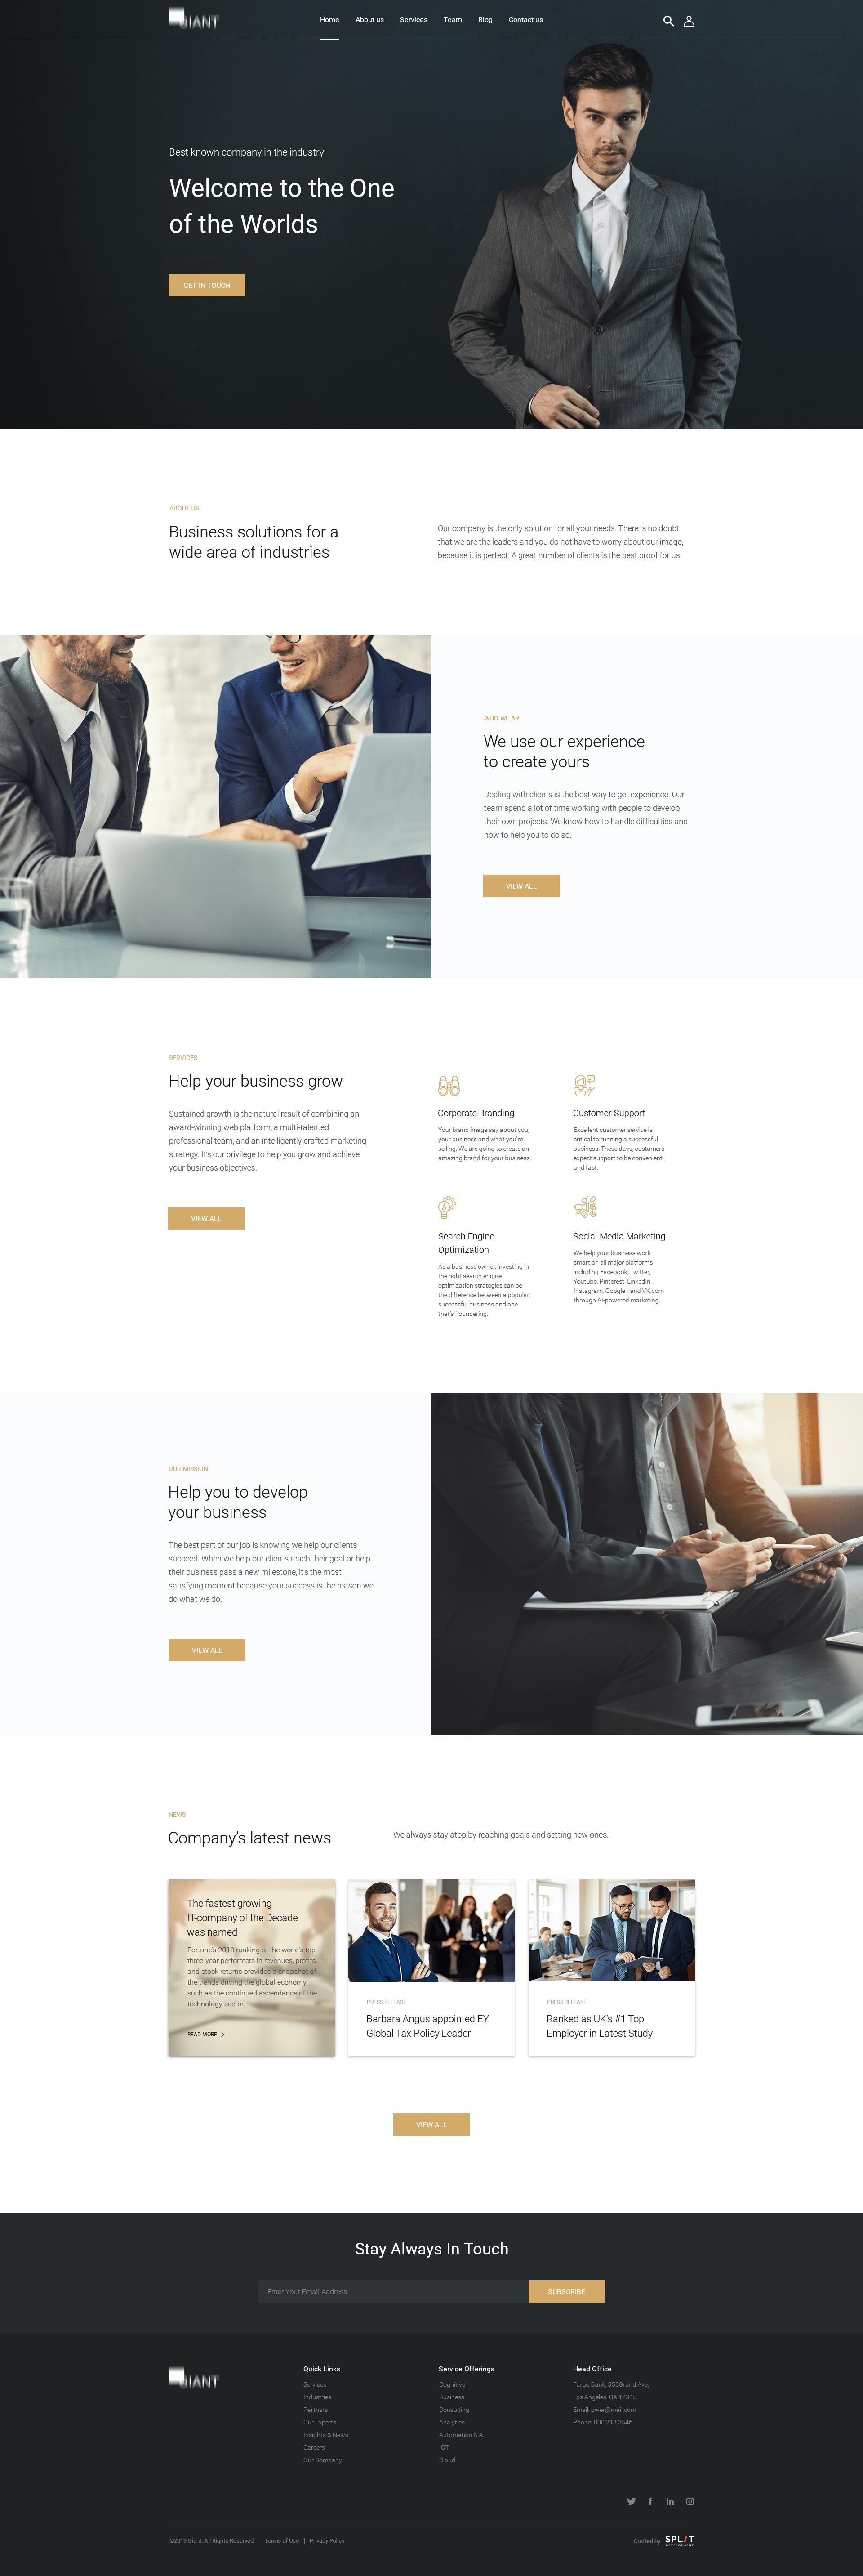 Consulting company design